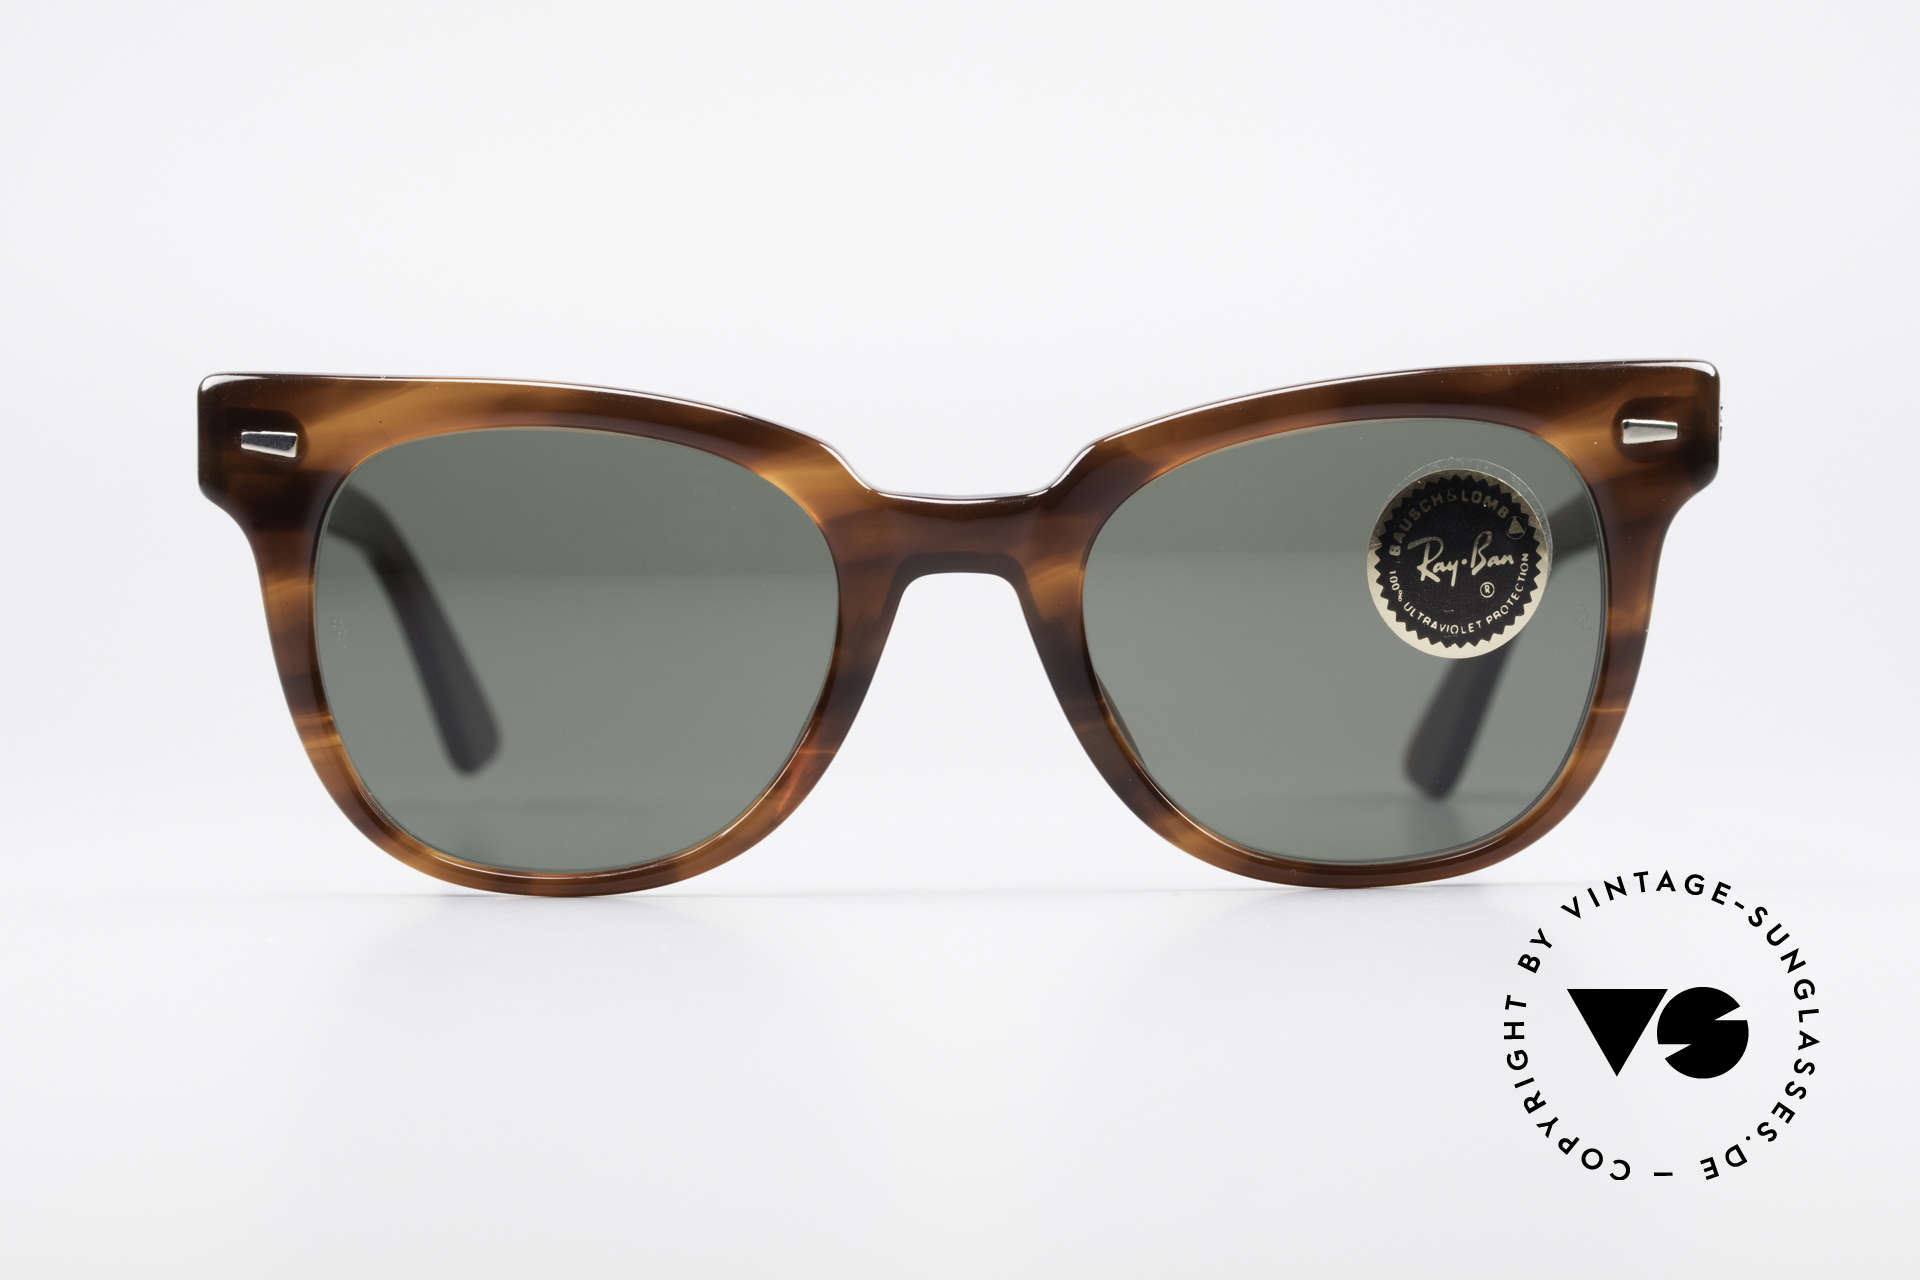 f22f8b654cd1f7 Sonnenbrillen Ray Ban Meteor 80er Vintage USA Sonnenbrille | Vintage ...